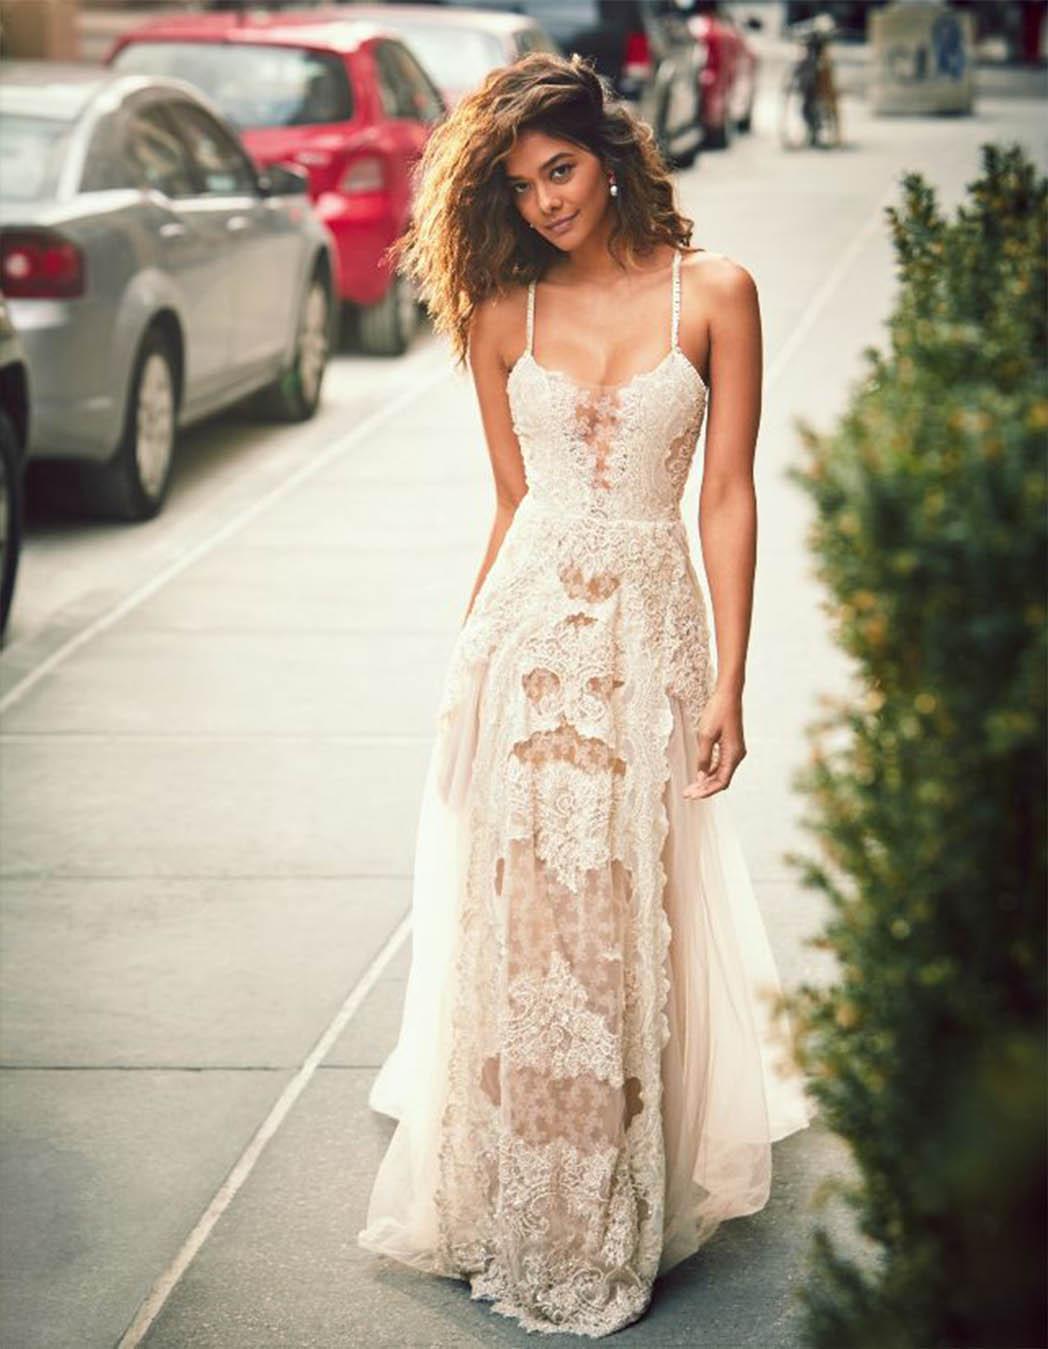 7eab20742 Vestidos juveniles para FIESTA elegantes - ElSexoso